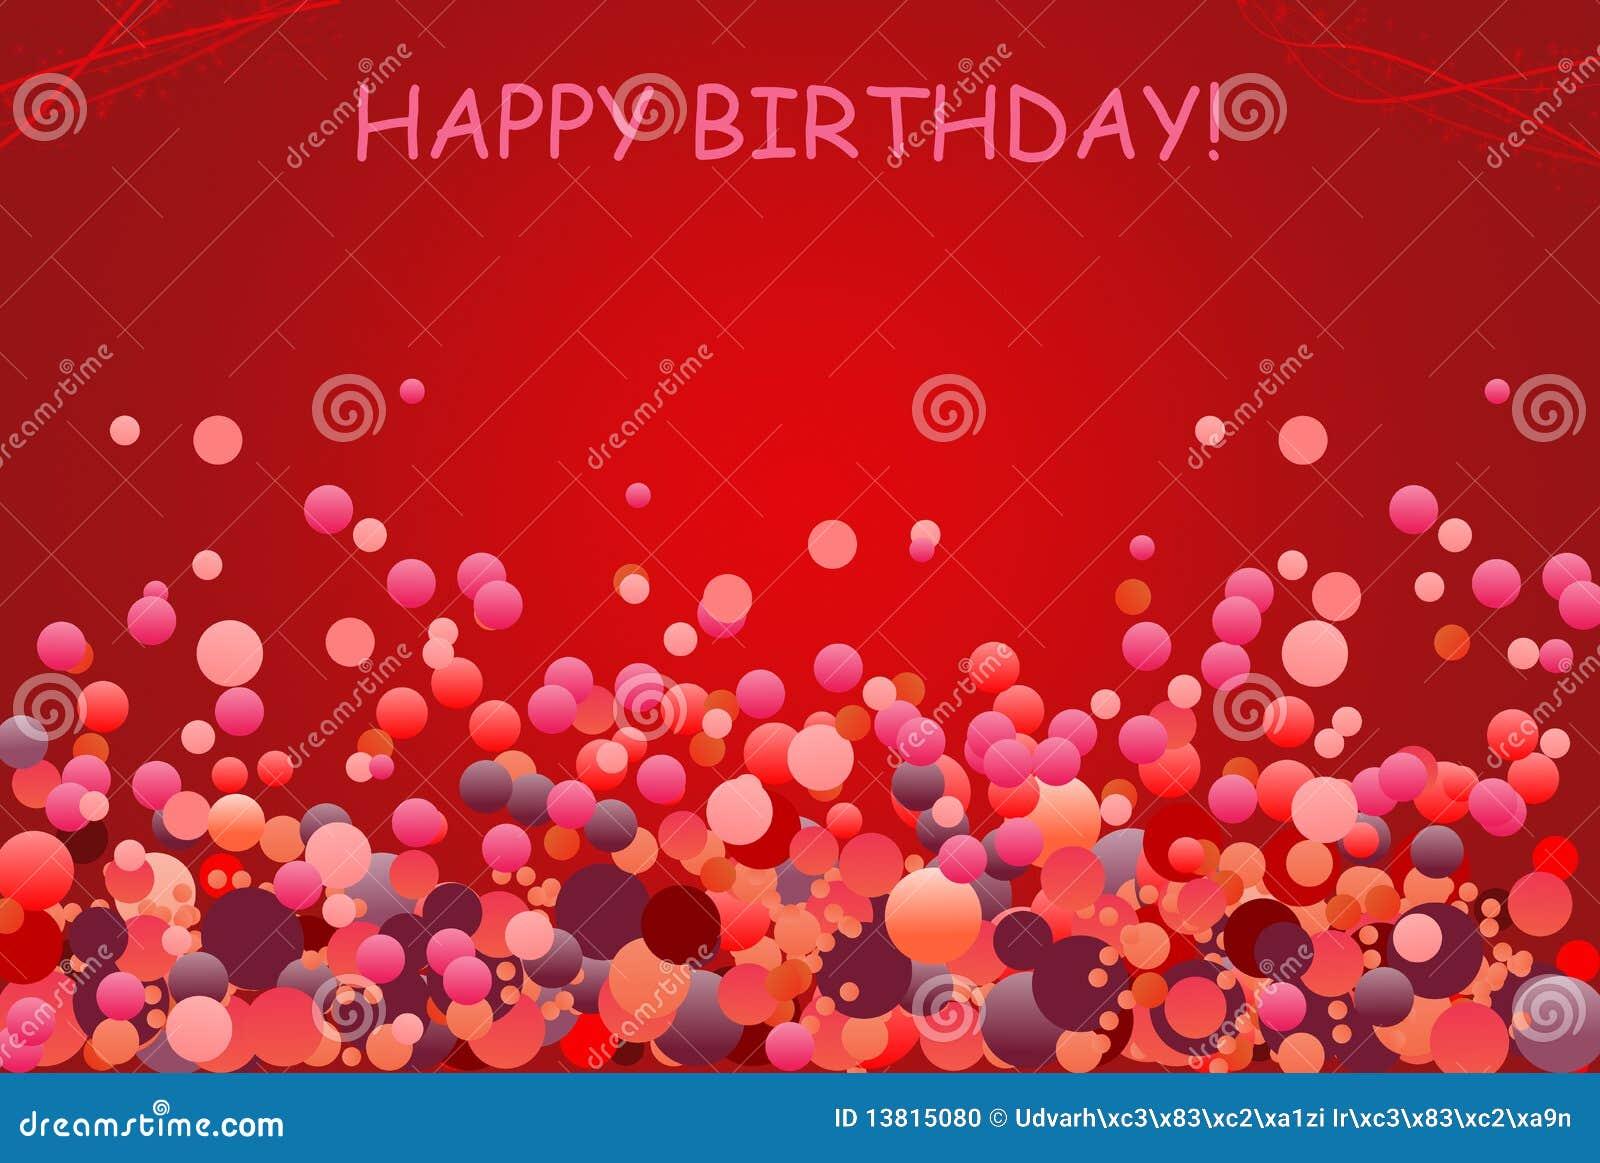 Greetings For Birthday Photo Image 41368444 – Greetings of Birthday